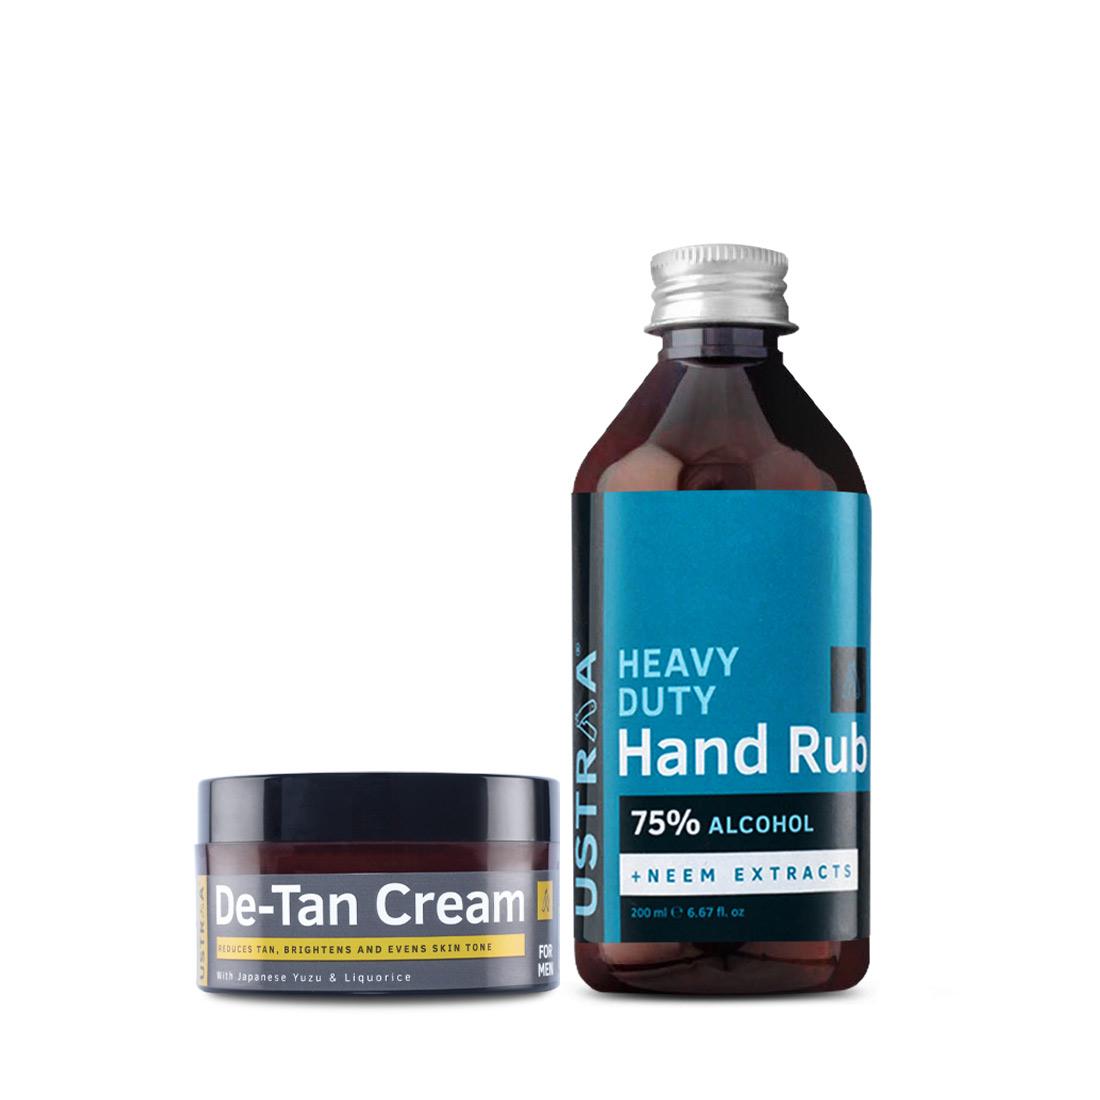 De-Tan Cream and Hand Rub - 200 ml